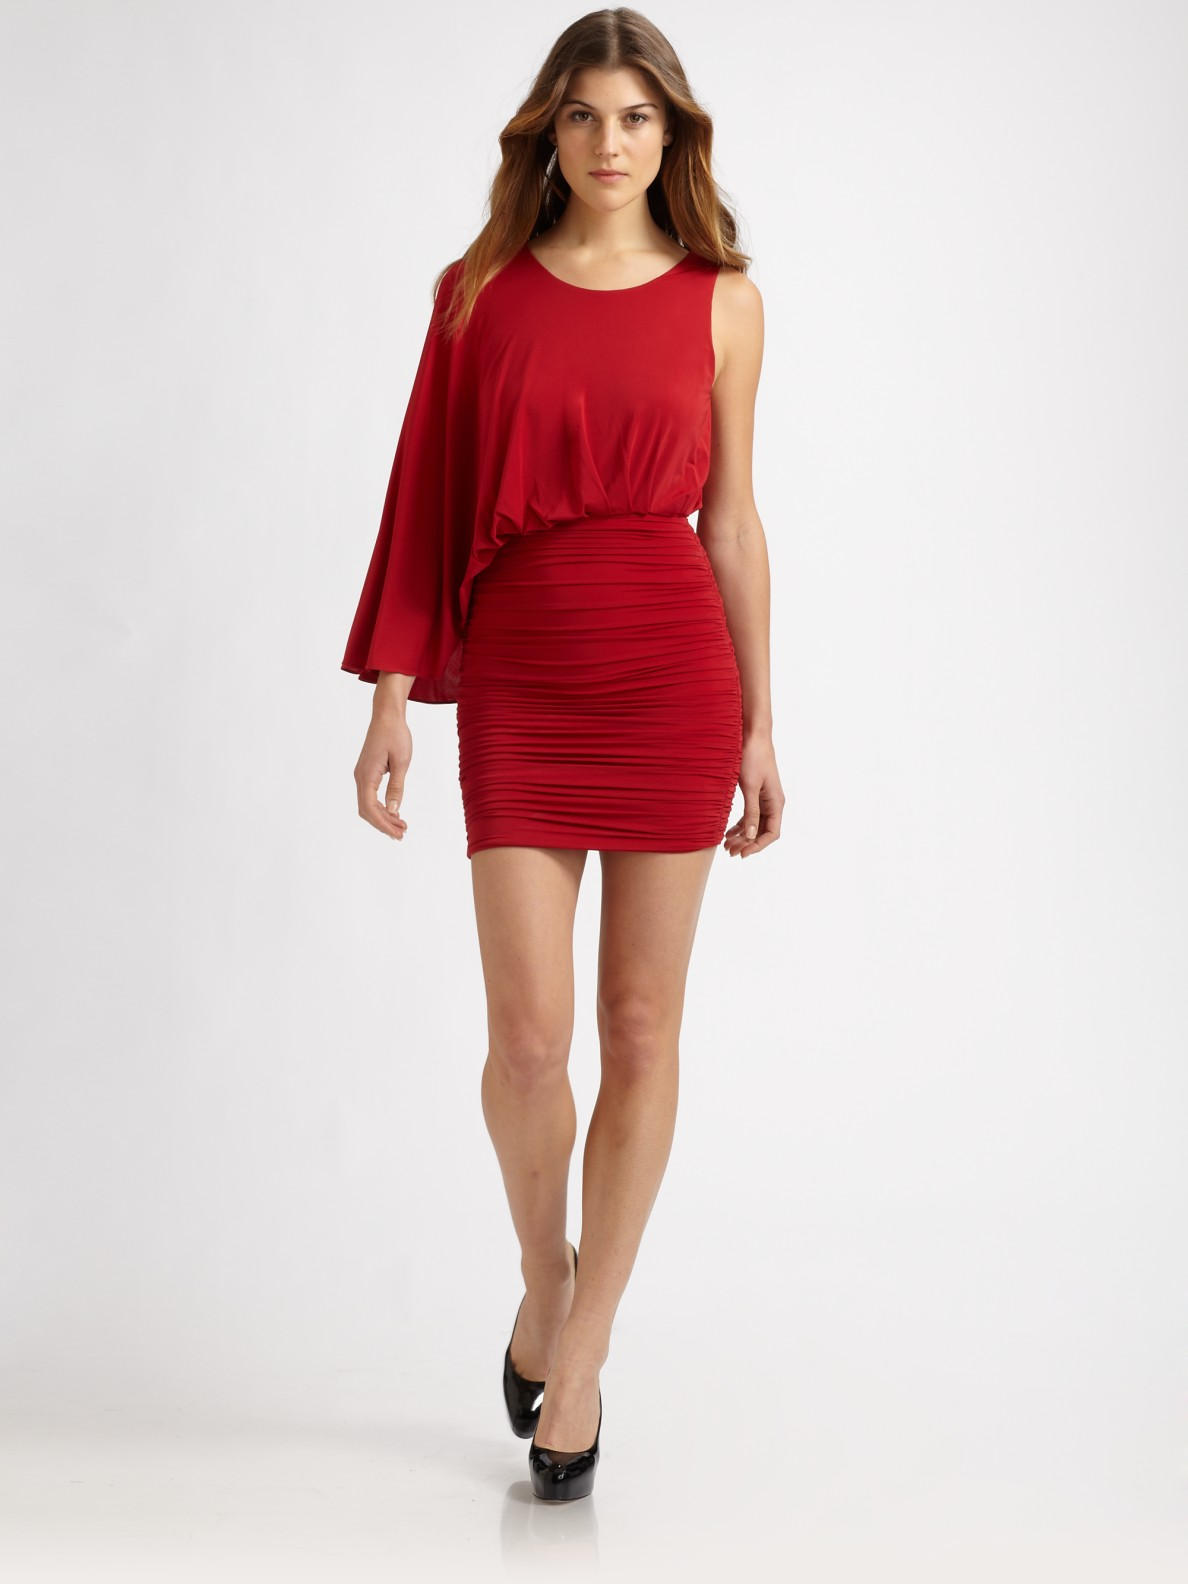 ee31d82bb71 Lyst - BCBGMAXAZRIA Venus Dress in Red